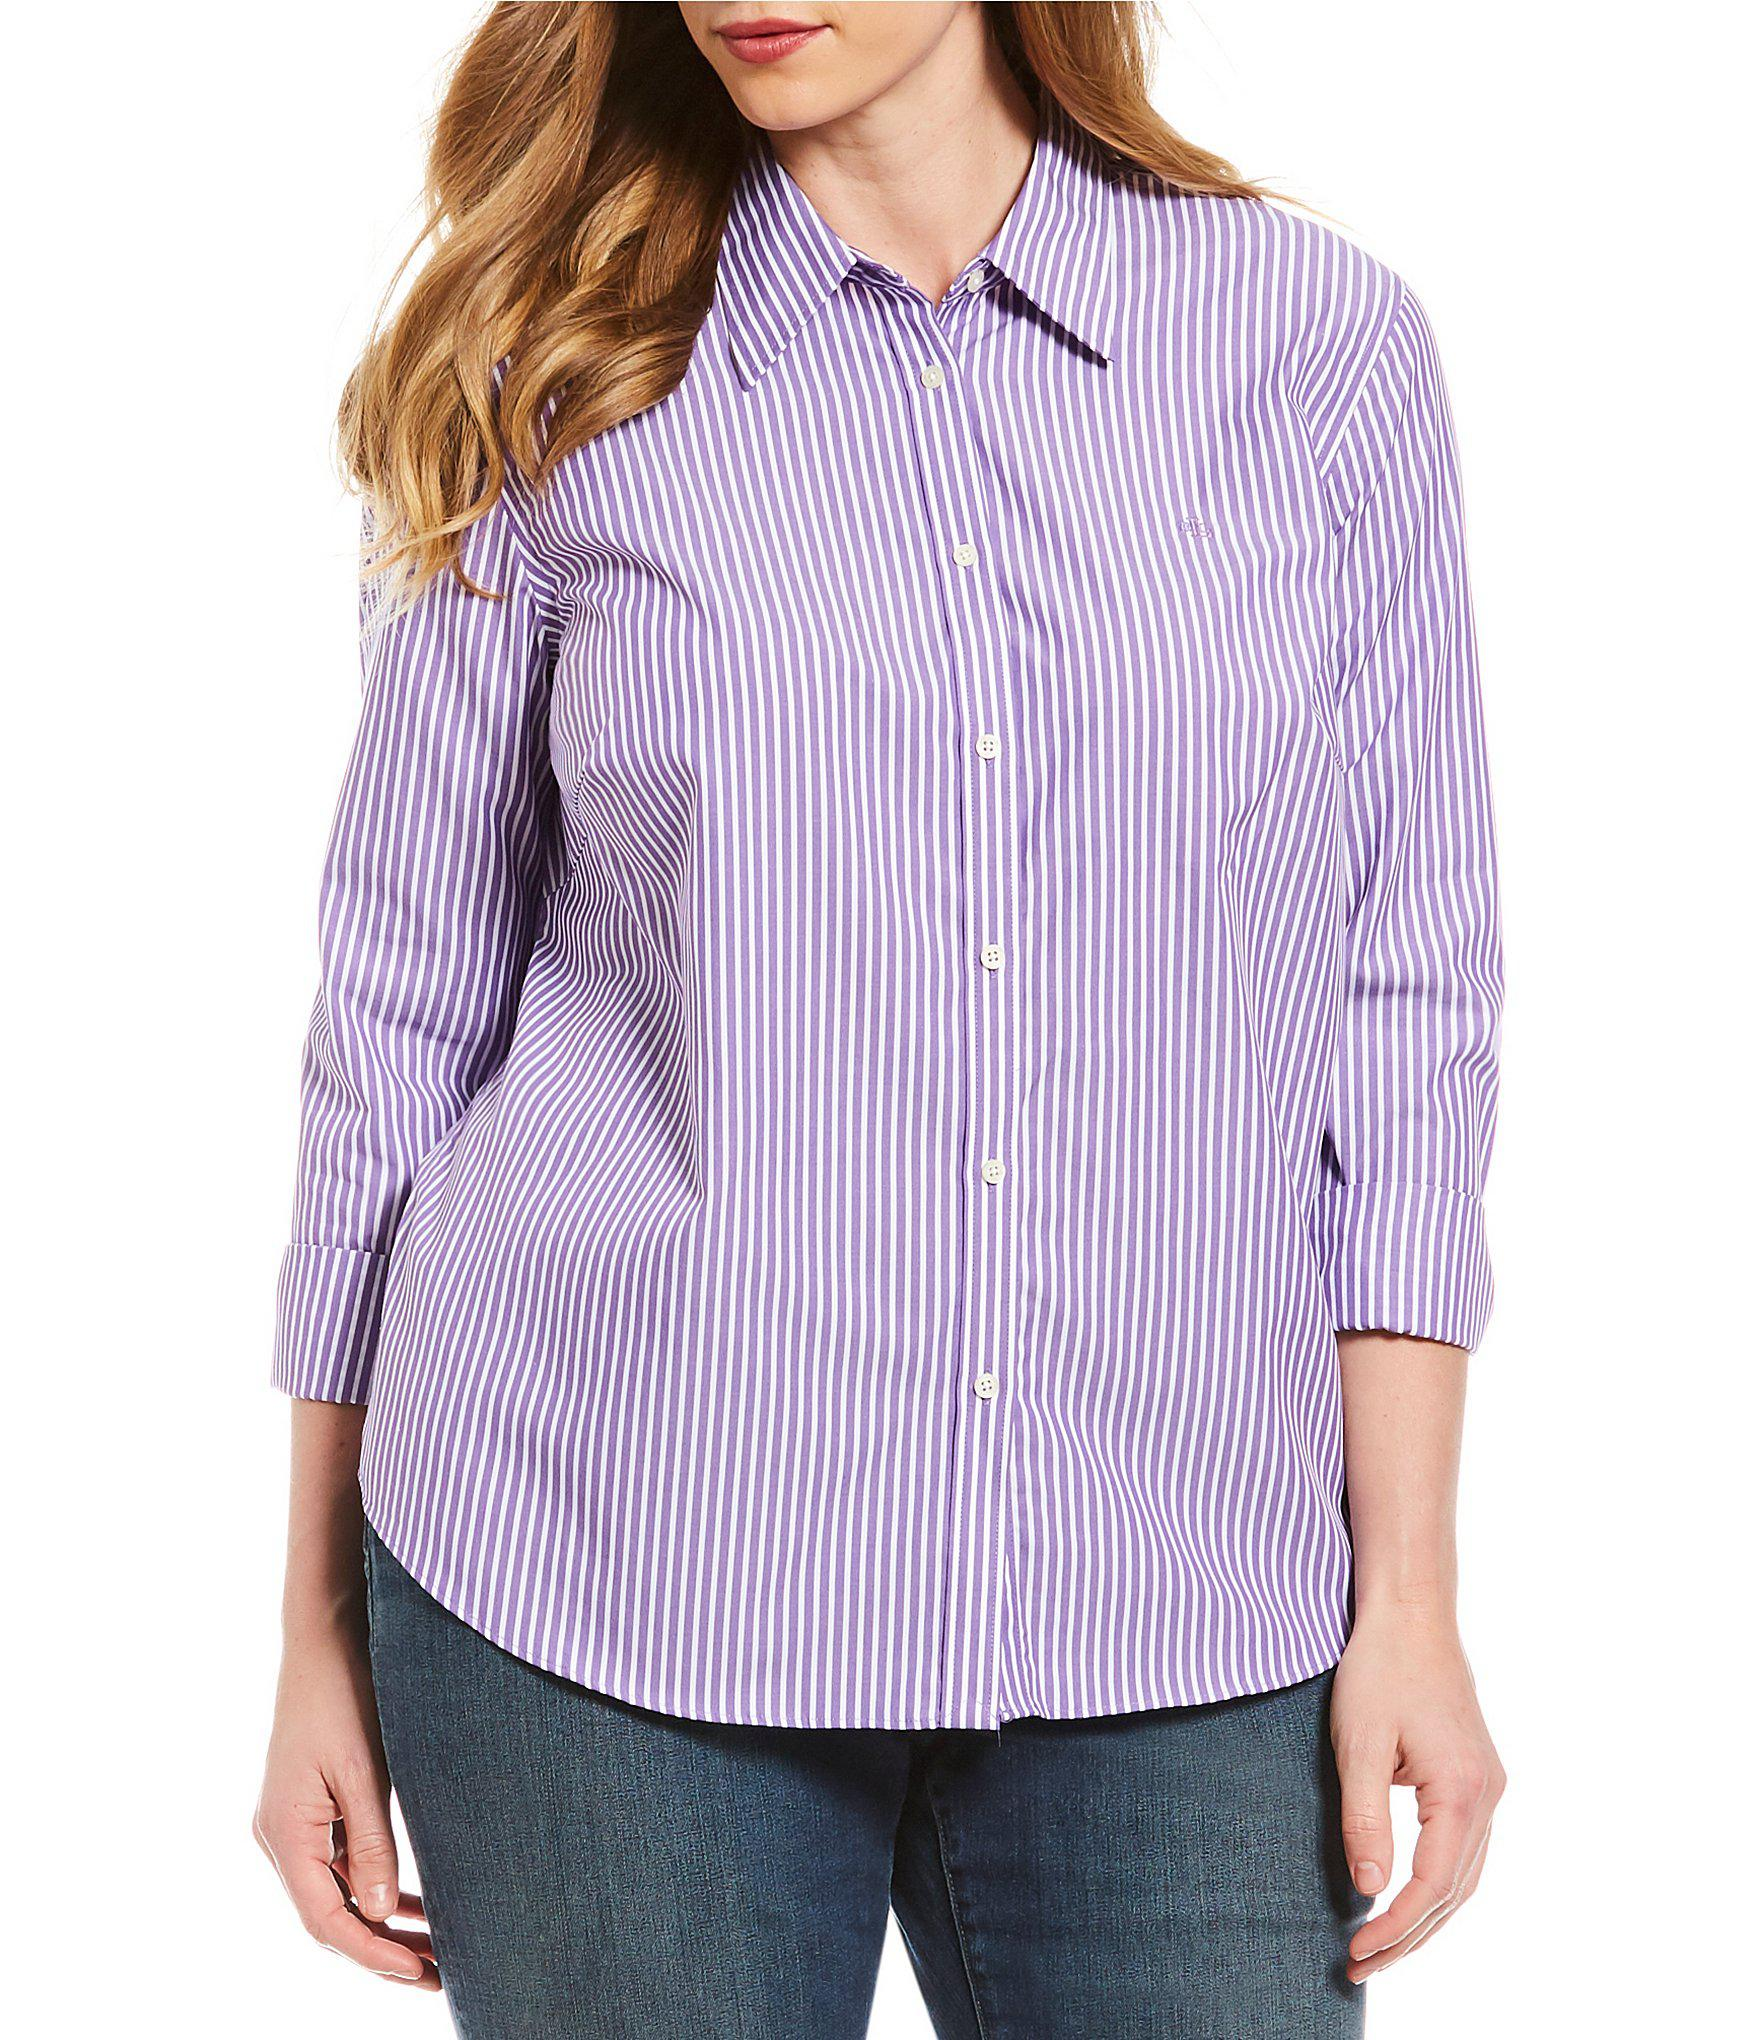 d635a89aa37 Lyst - Lauren by Ralph Lauren Plus Size Cotton Button-down Shirt in ...